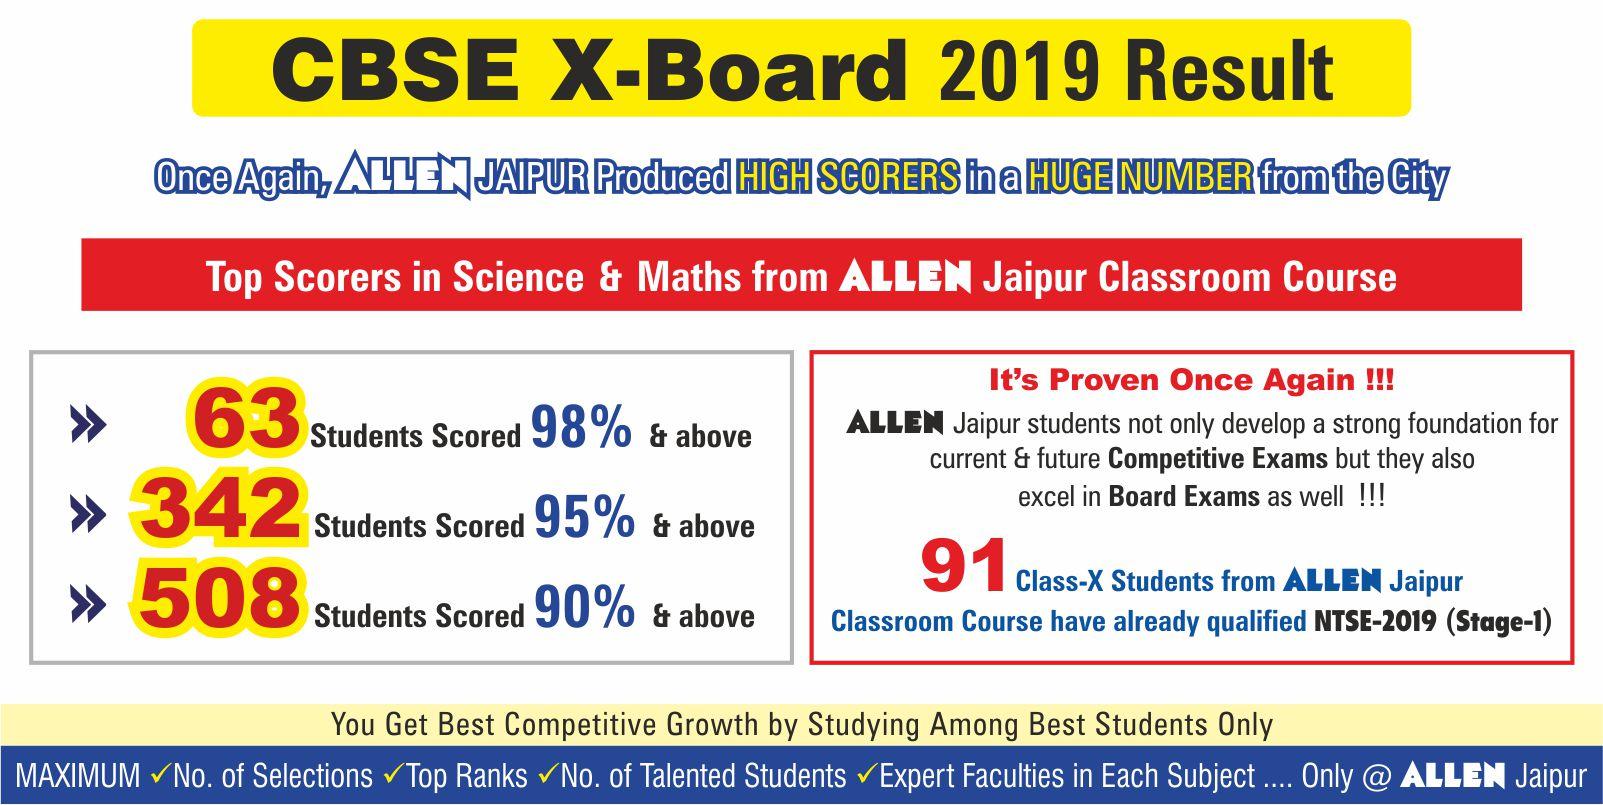 CBSE Class-X Result 2019